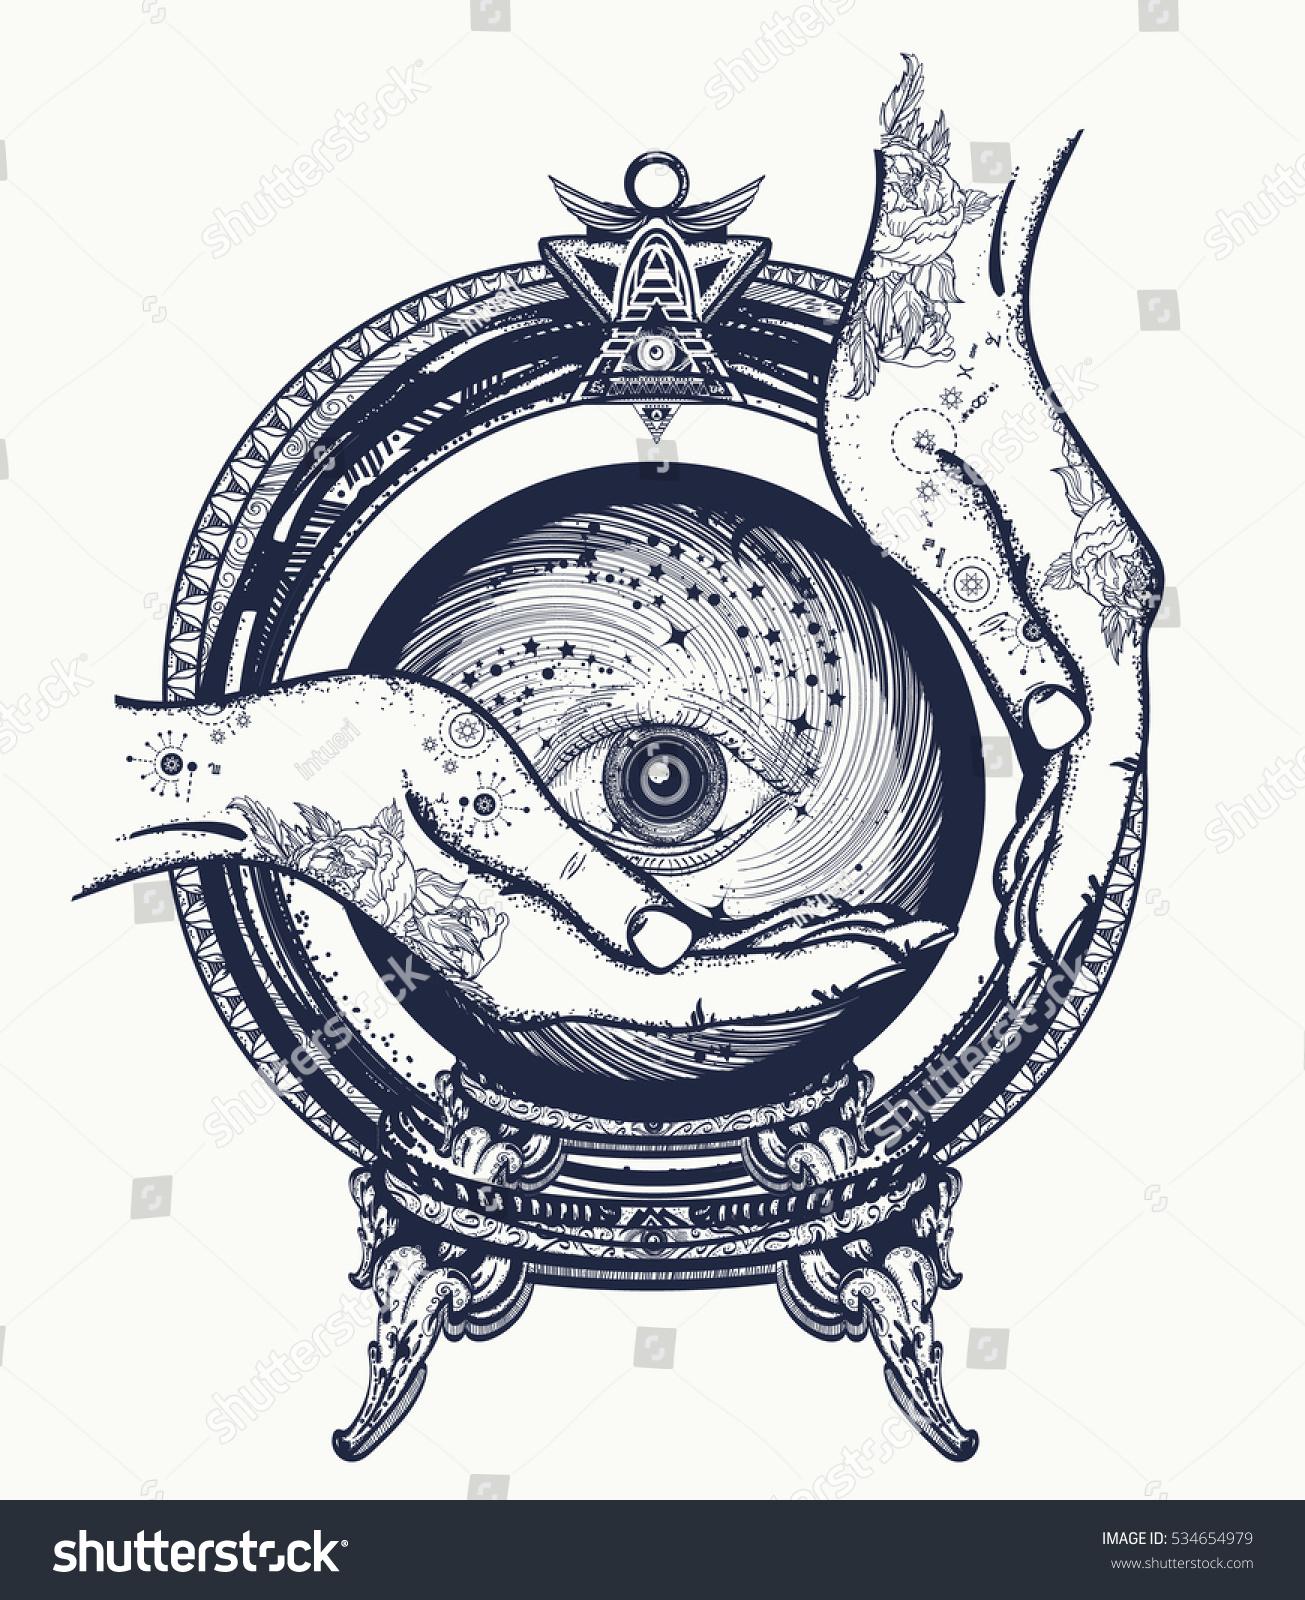 154 best FORTUNE TELLERS & GYPSIES images on Pinterest ... |Gypsy Fortune Teller Symbols